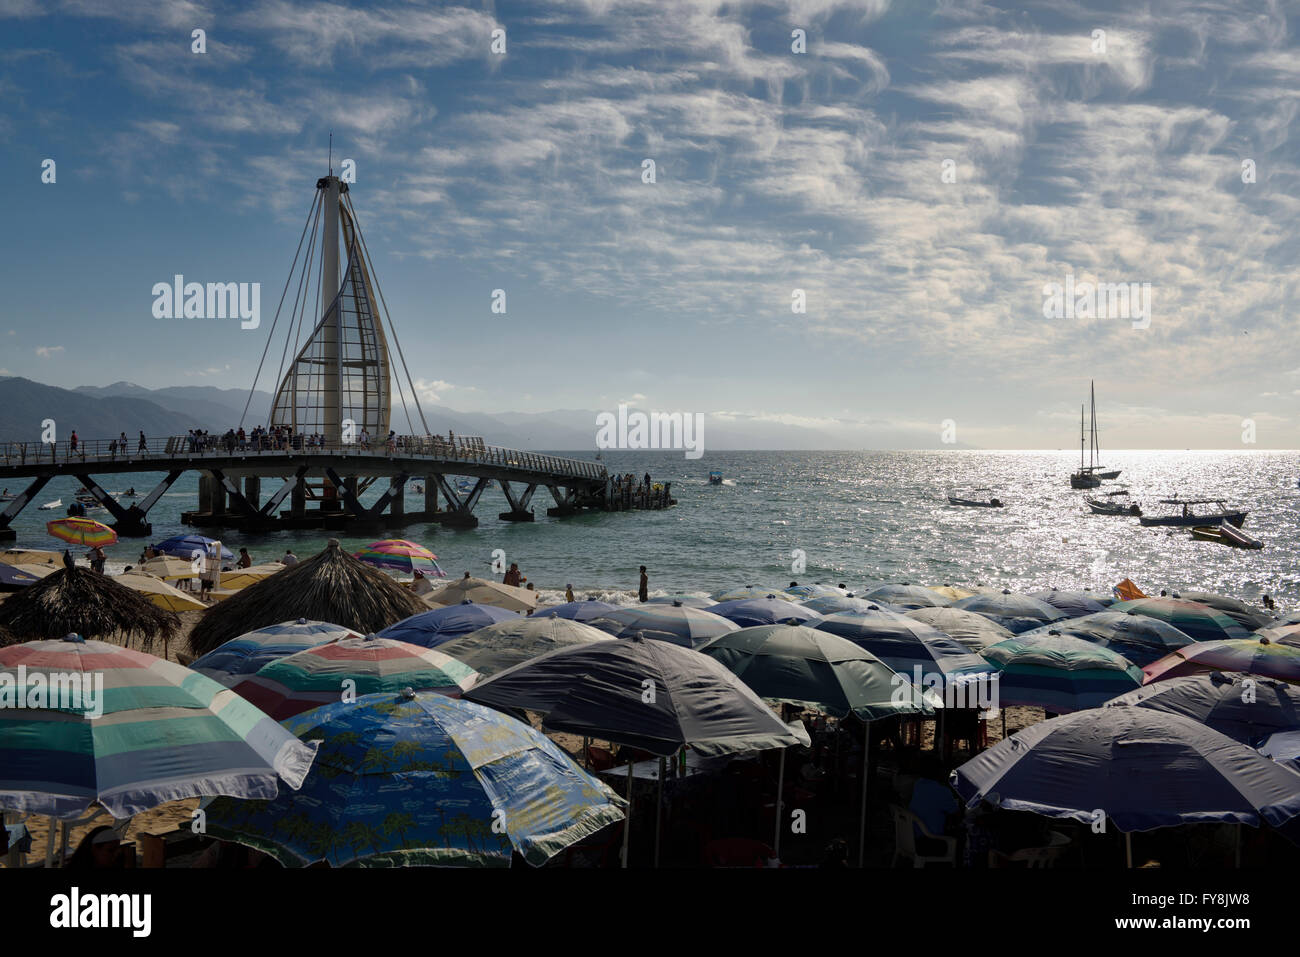 Beach umbrellas on Los Muertos beach at the Pier and Sierra Madre mountains Puerto Vallarta Mexico - Stock Image